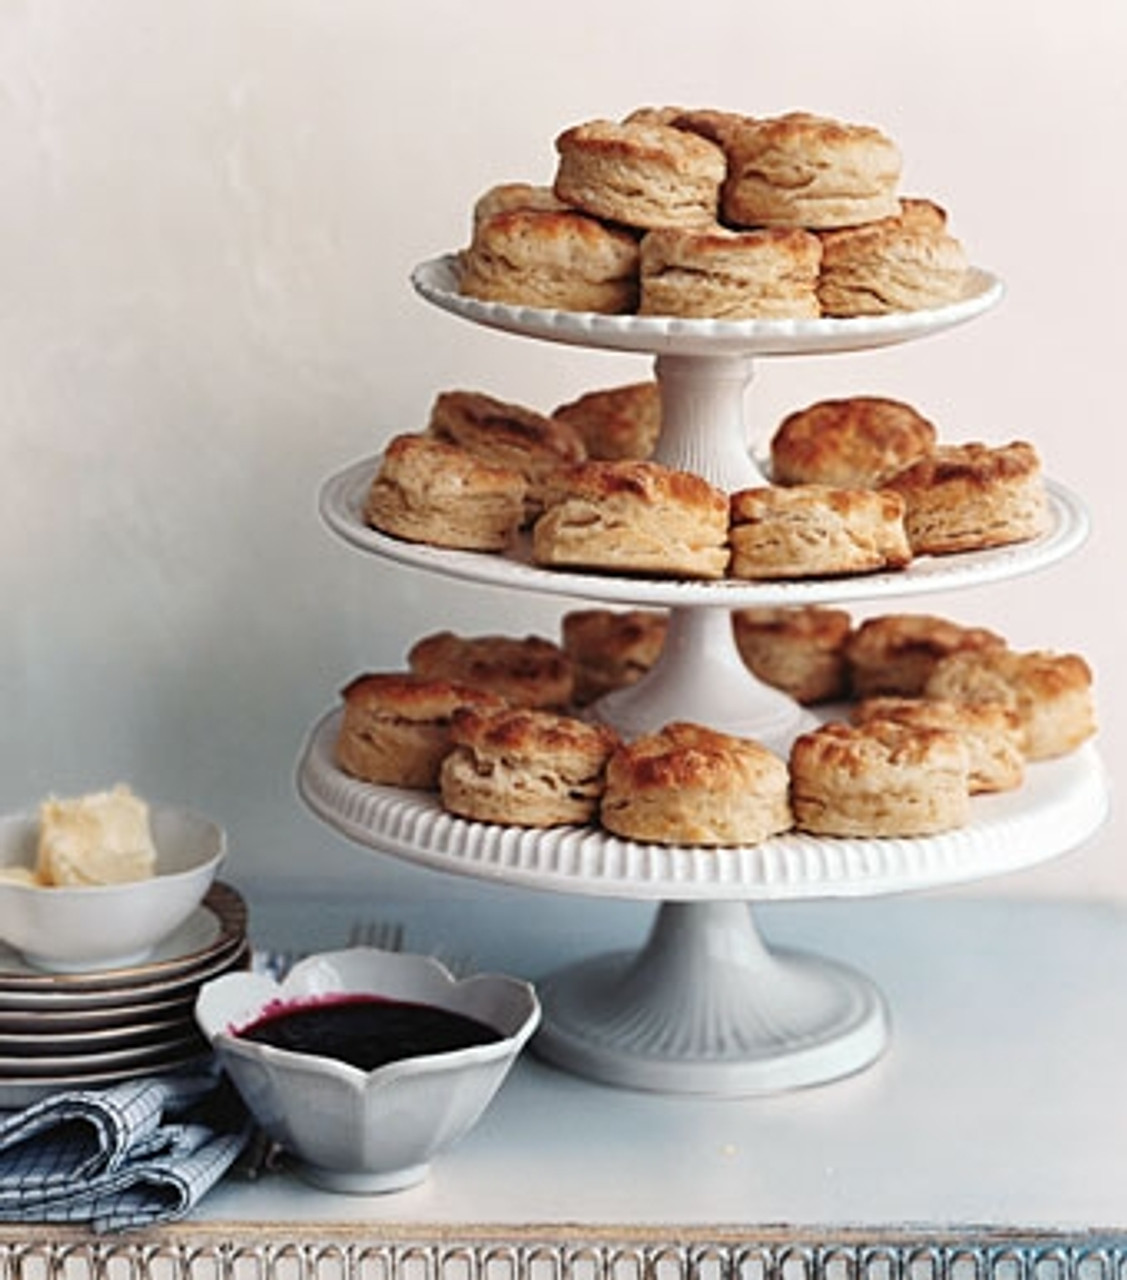 Biscuits & Muffins